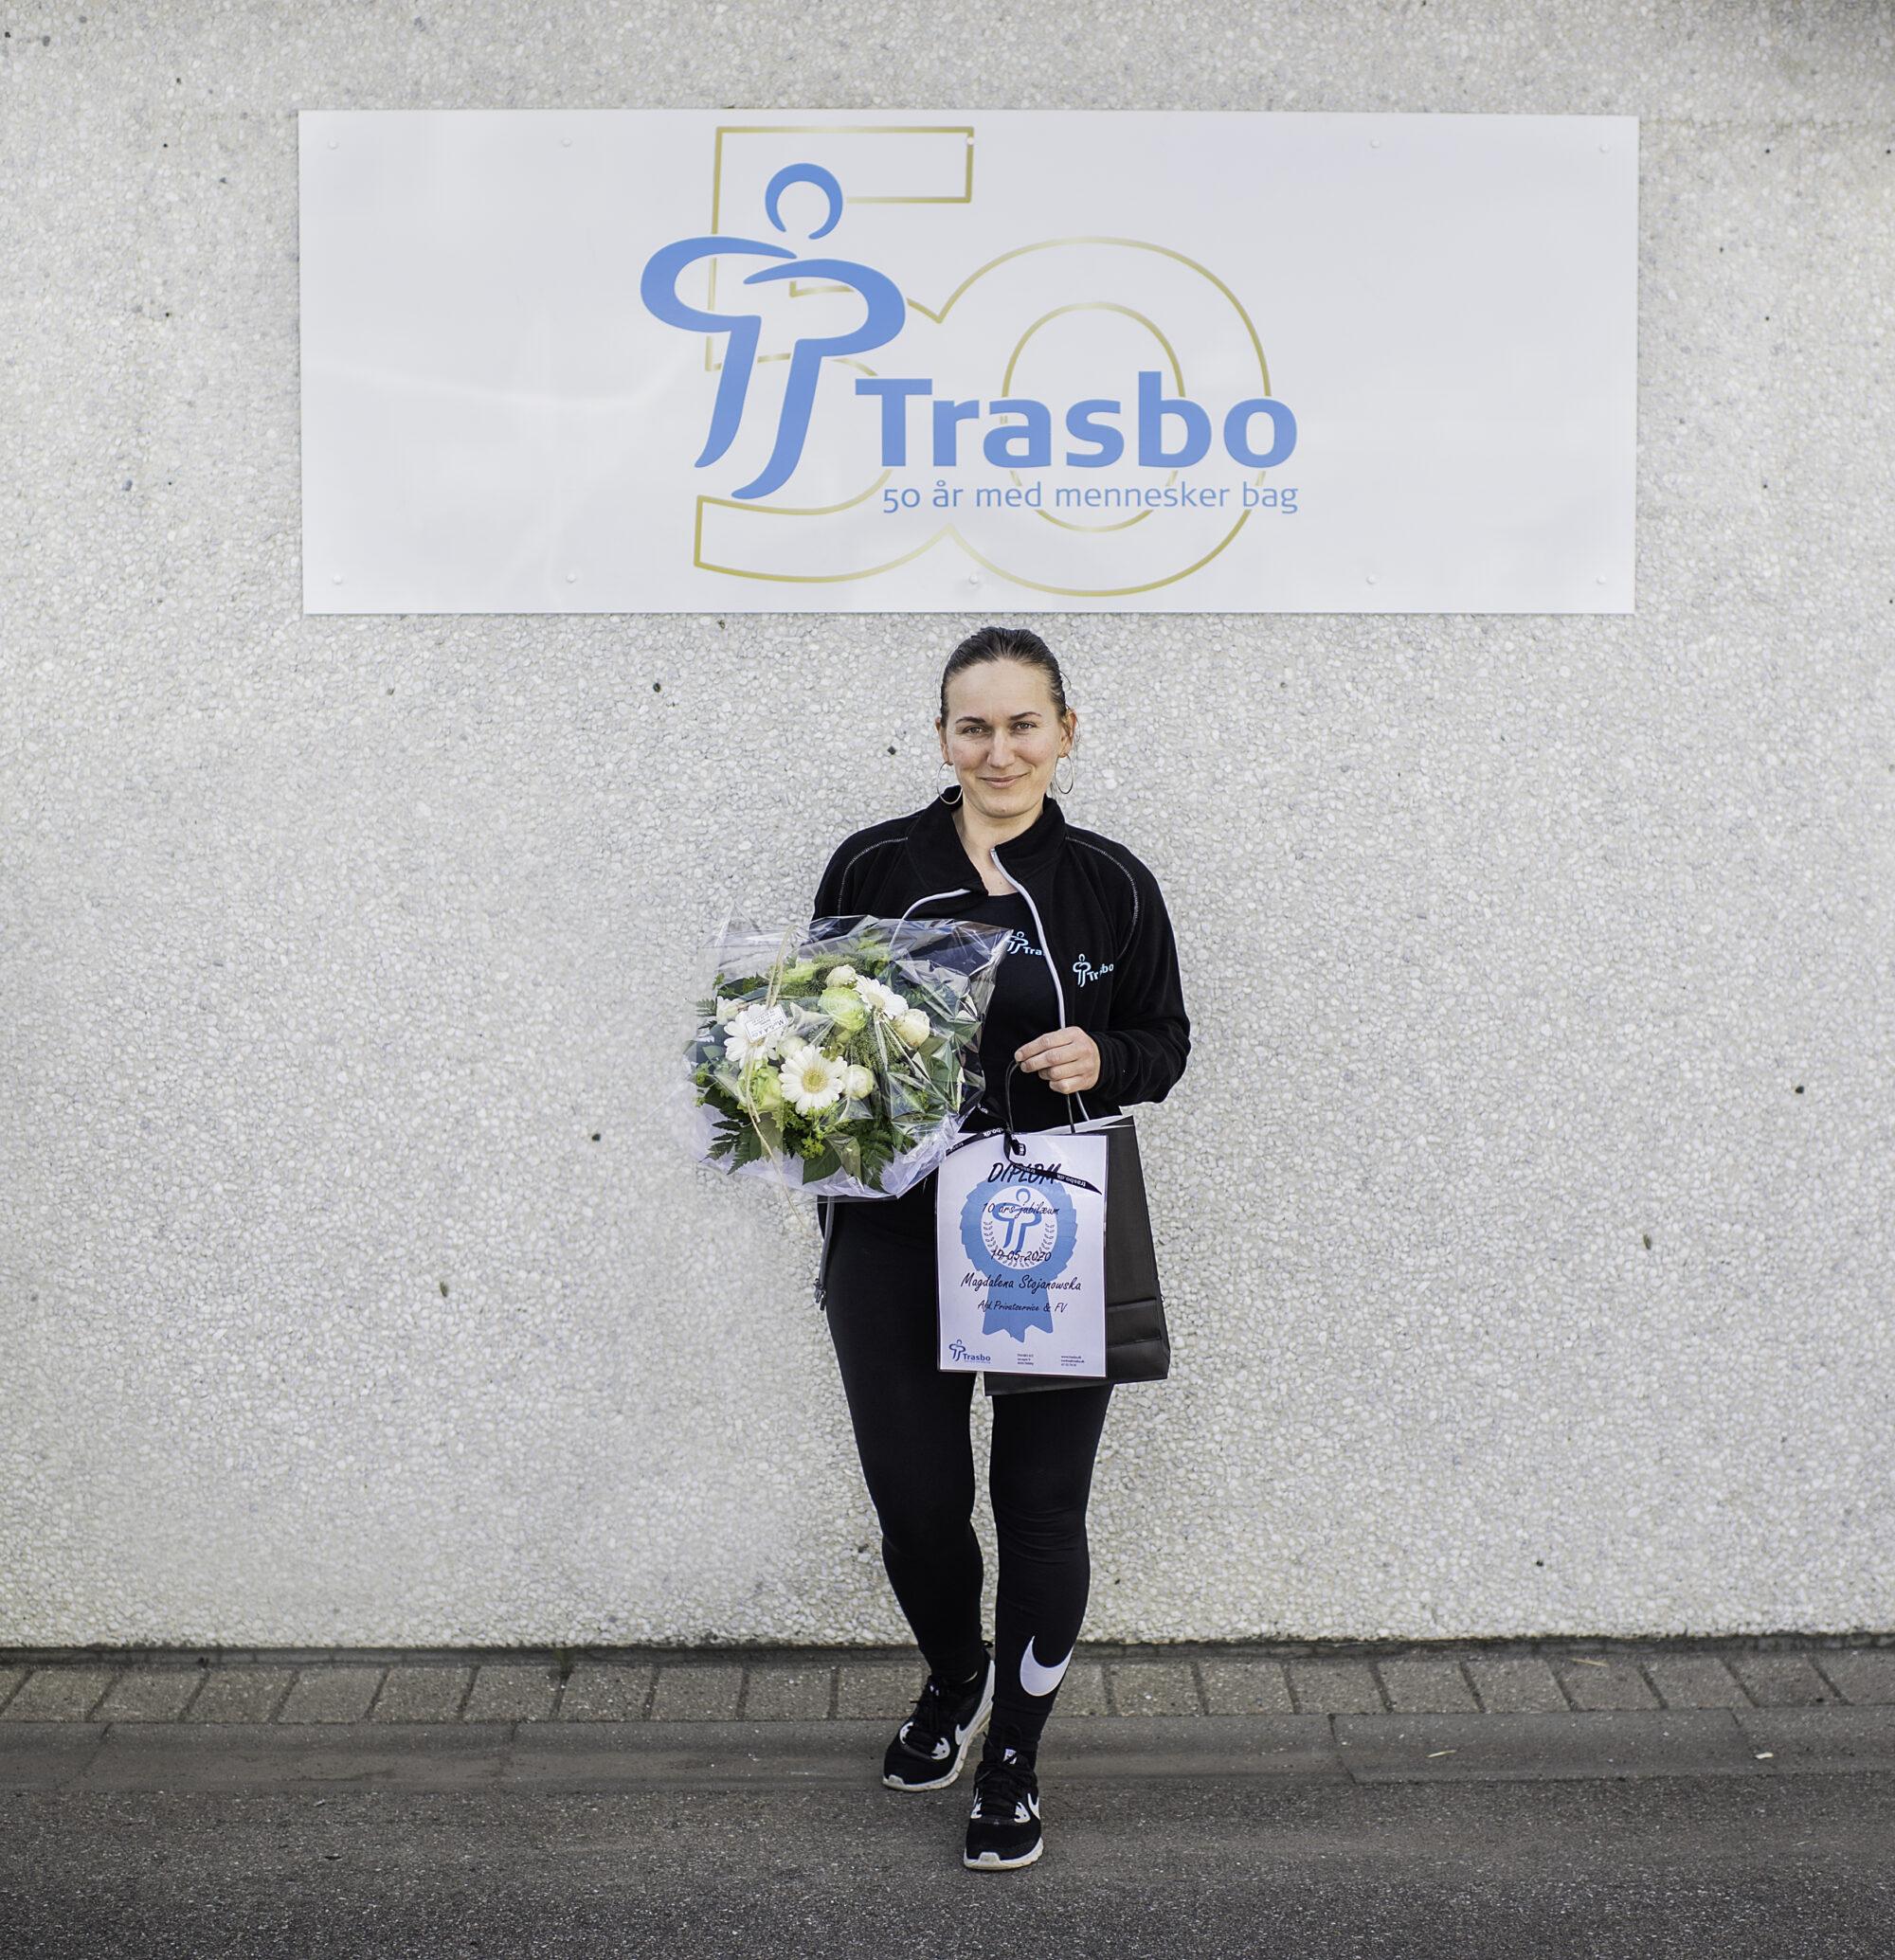 Jubilæum Trasbo 10 år